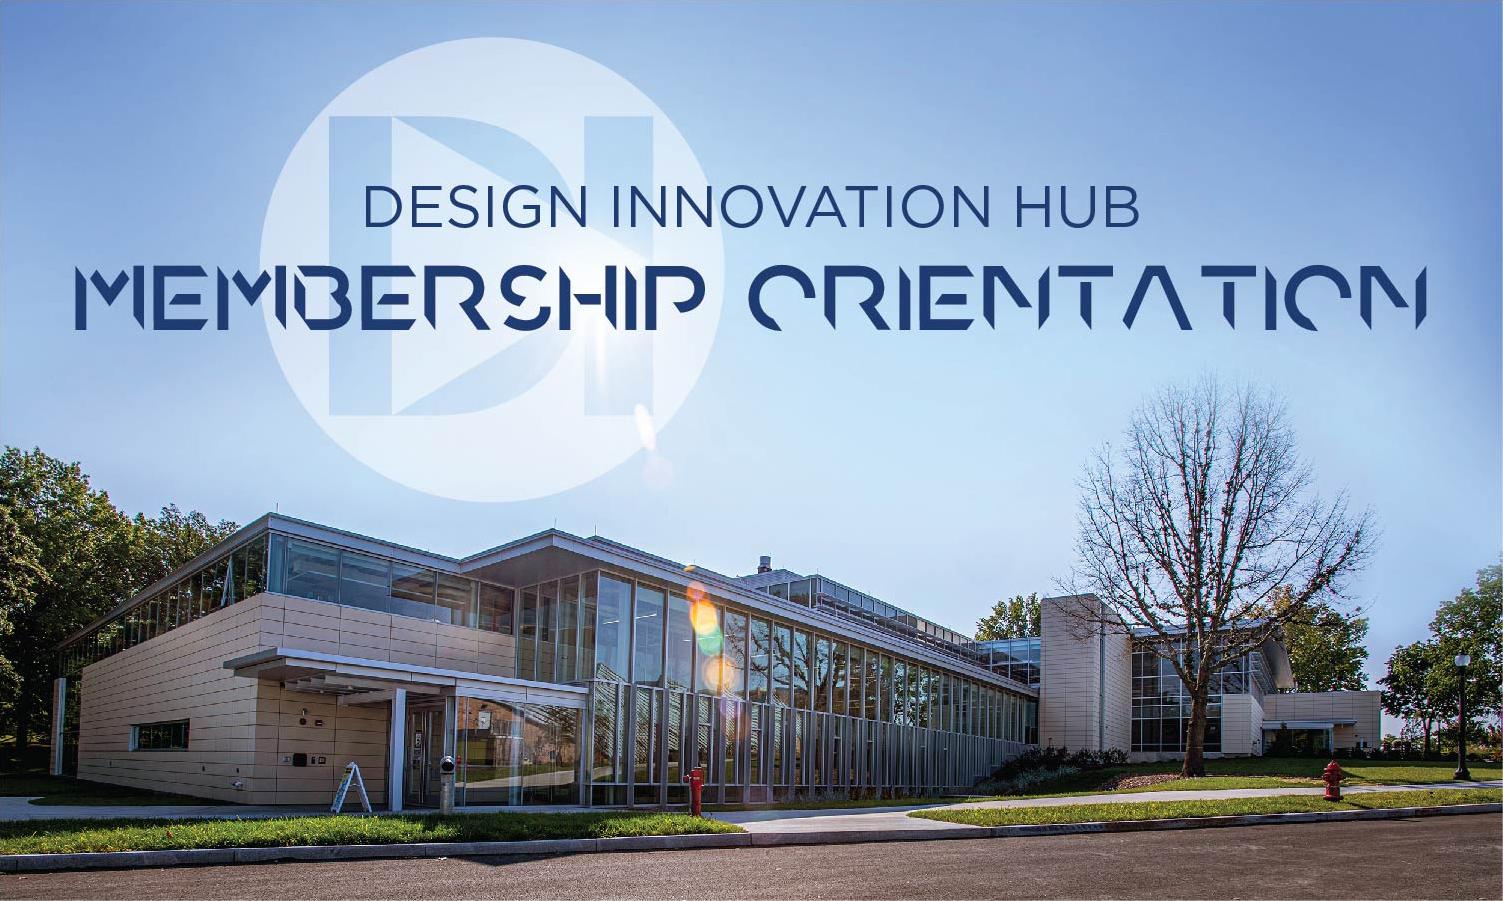 Design Innovation Hub Membership Orientation